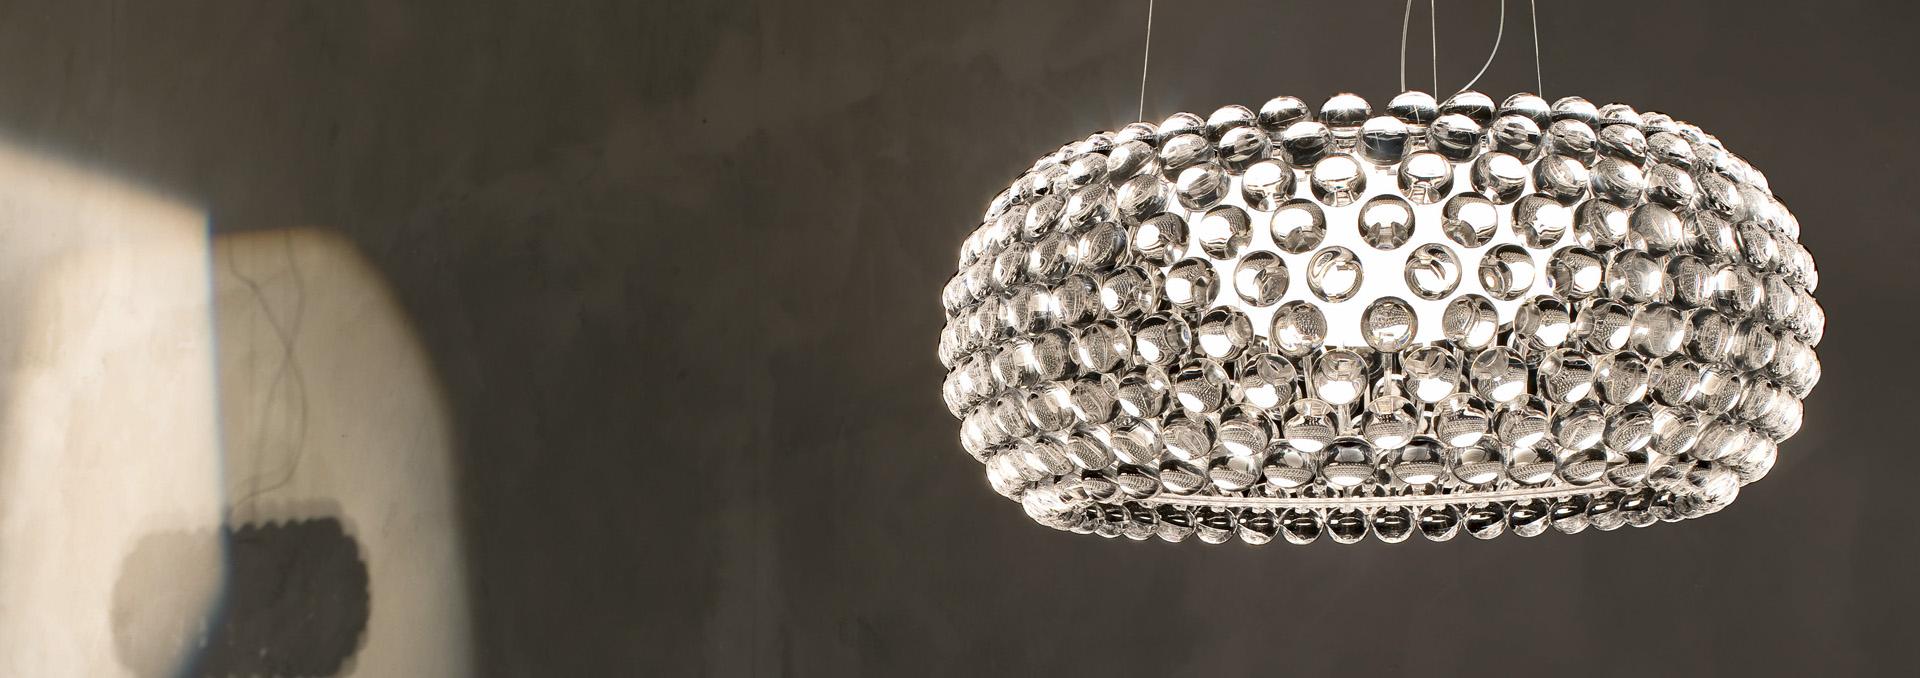 Captivating Lörler | Licht, Leuchten, Lampen | Mainz Gallery